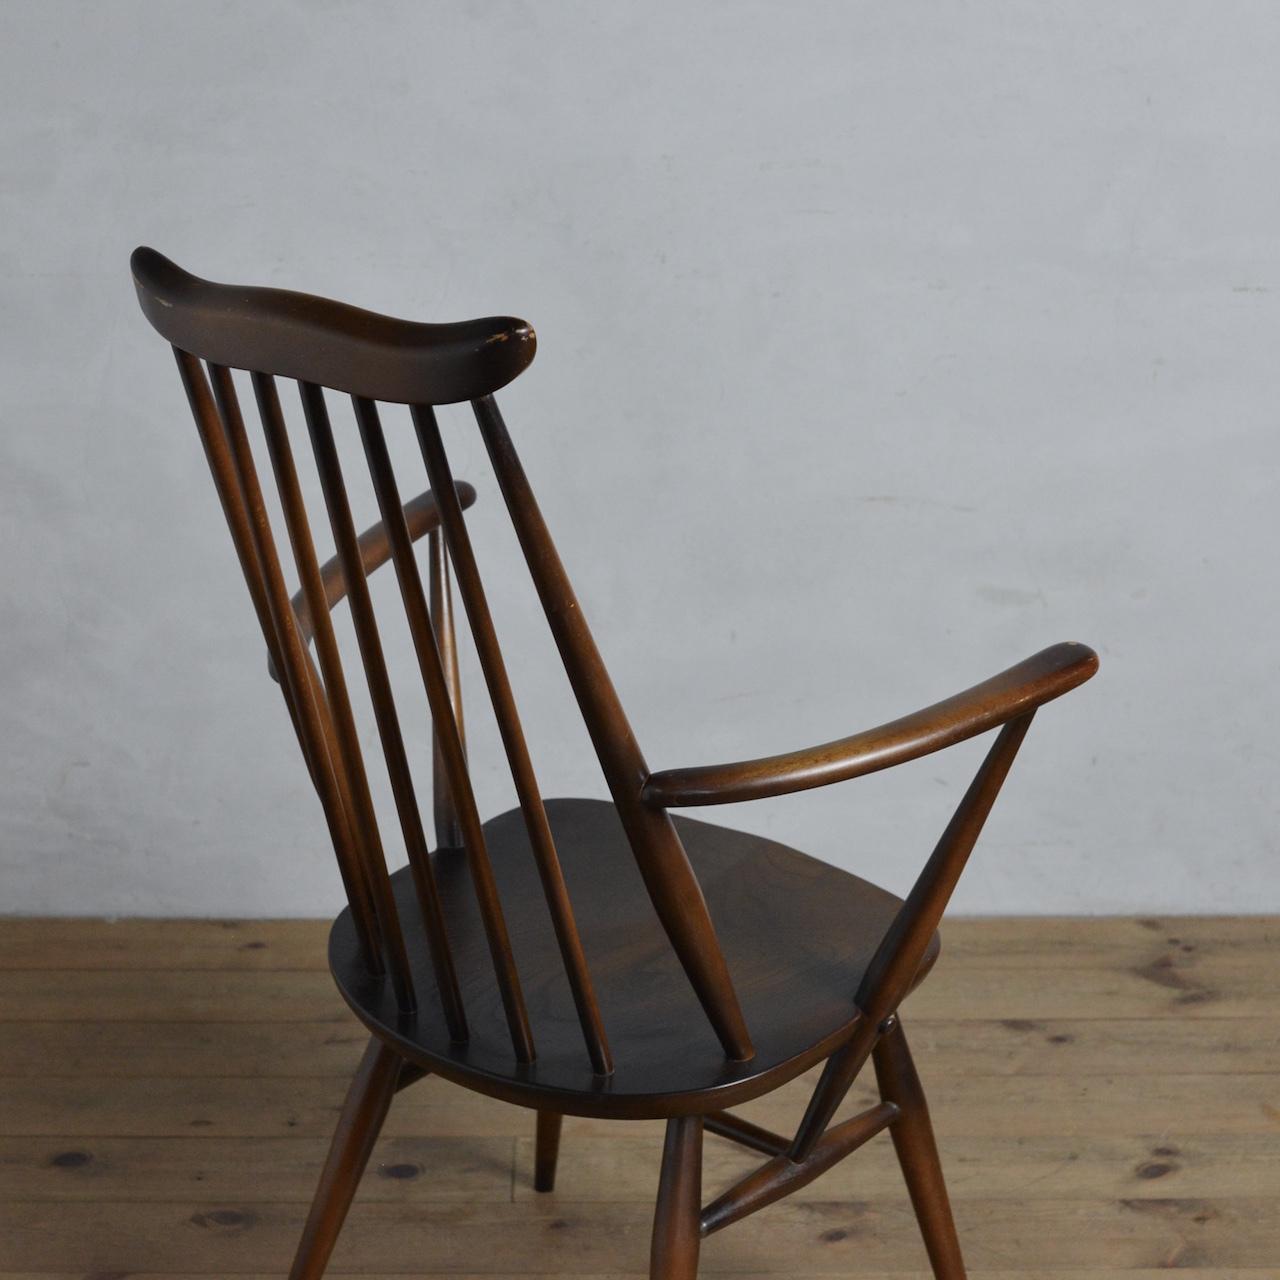 Ercol Goldsmith Arm Chair / アーコール ゴールドスミス アーム チェア 〈ダイニングチェア・デスクチェア〉112157